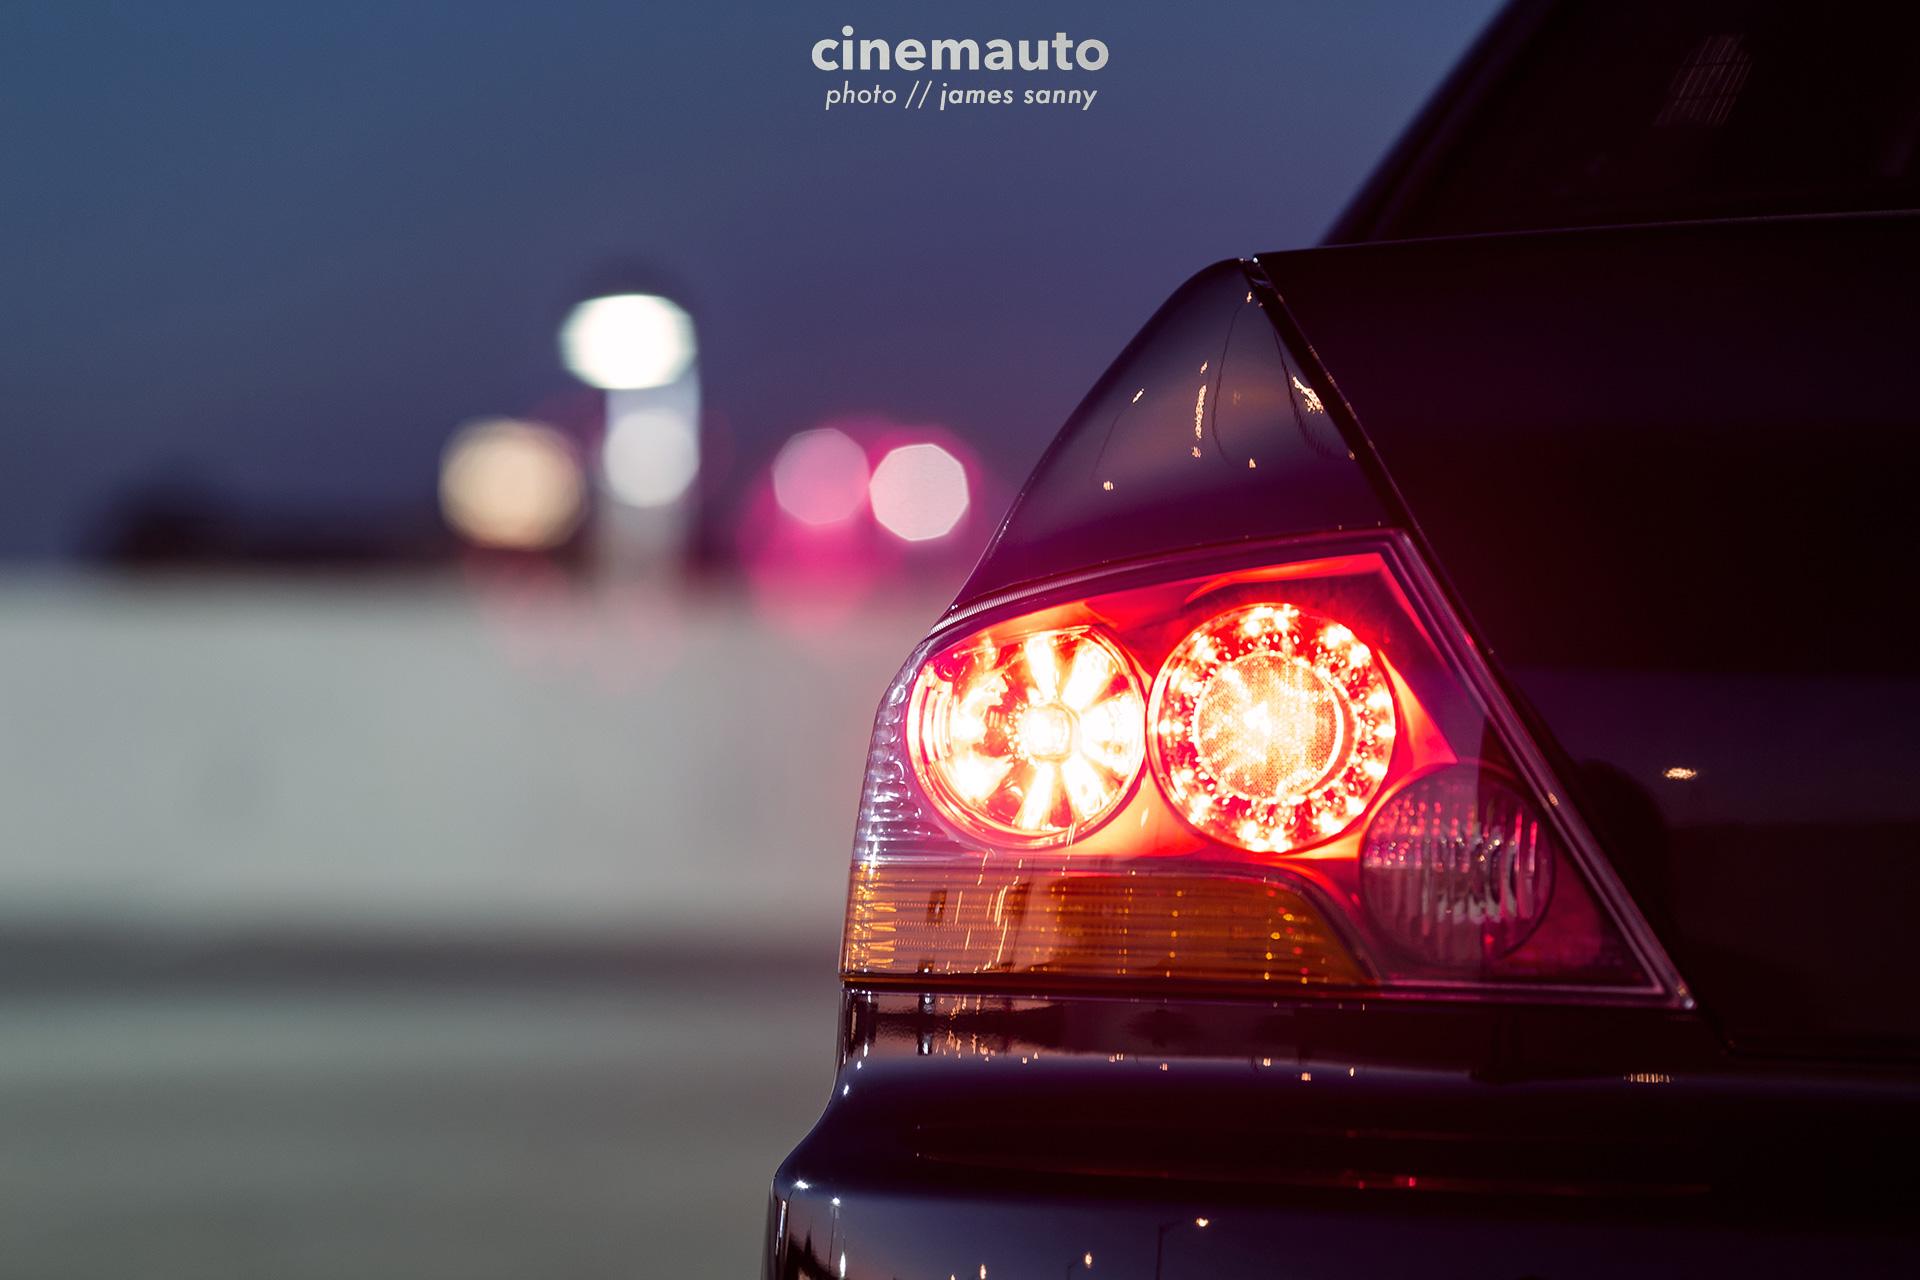 wichita-automotive-photographer-cinemauto-james-sanny-tj5sm.jpg